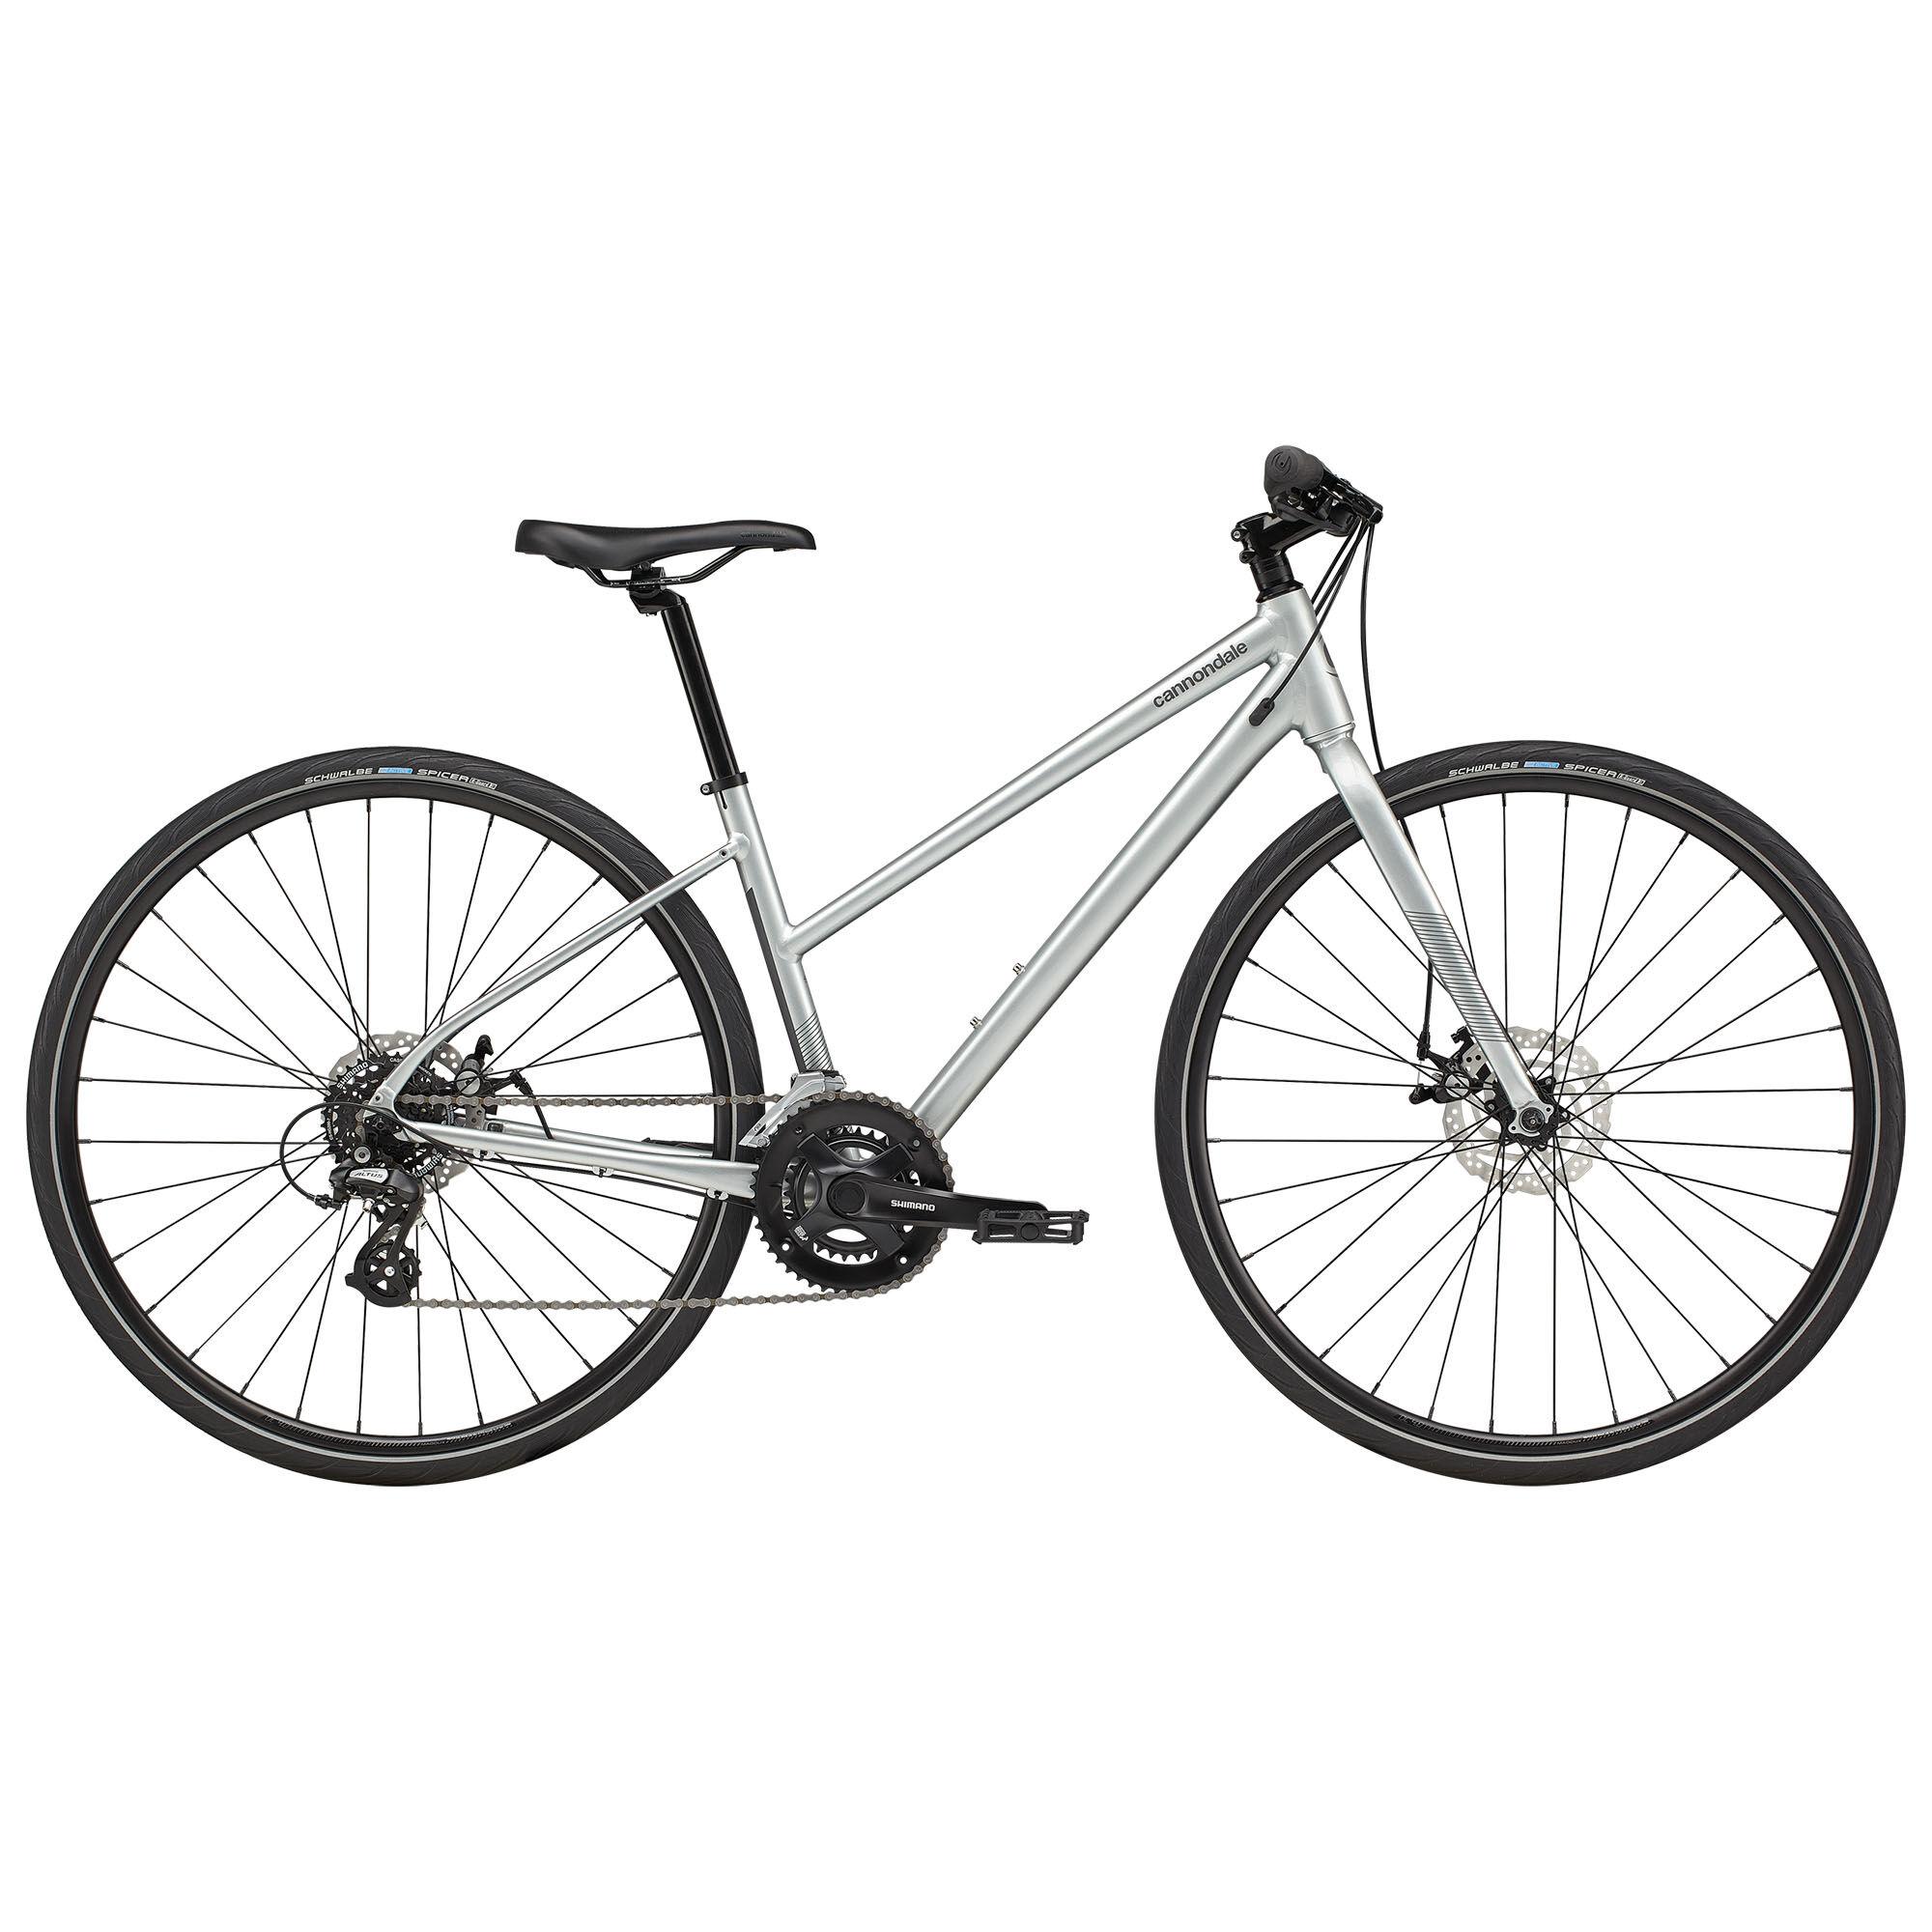 Cannondale Women's Quick 5 Remixte Urban Bike '21  - Sage Grey - Size: Small